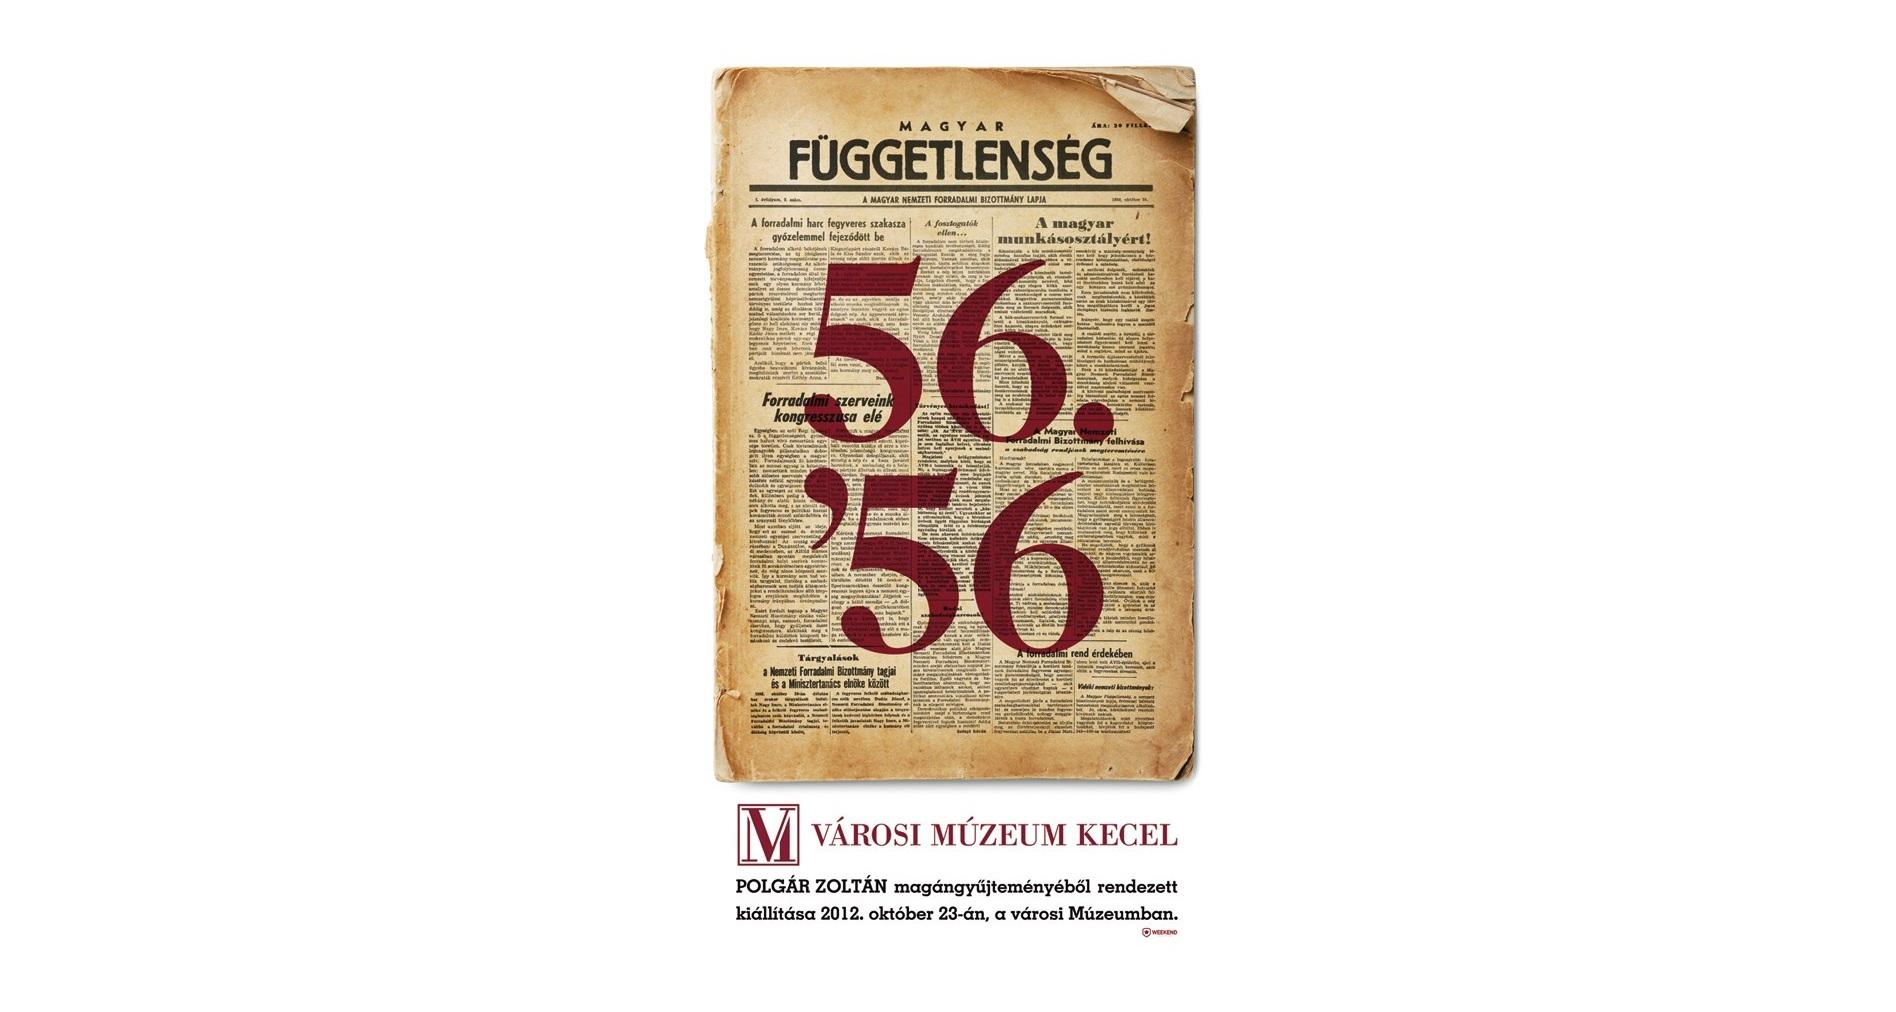 56 plakker